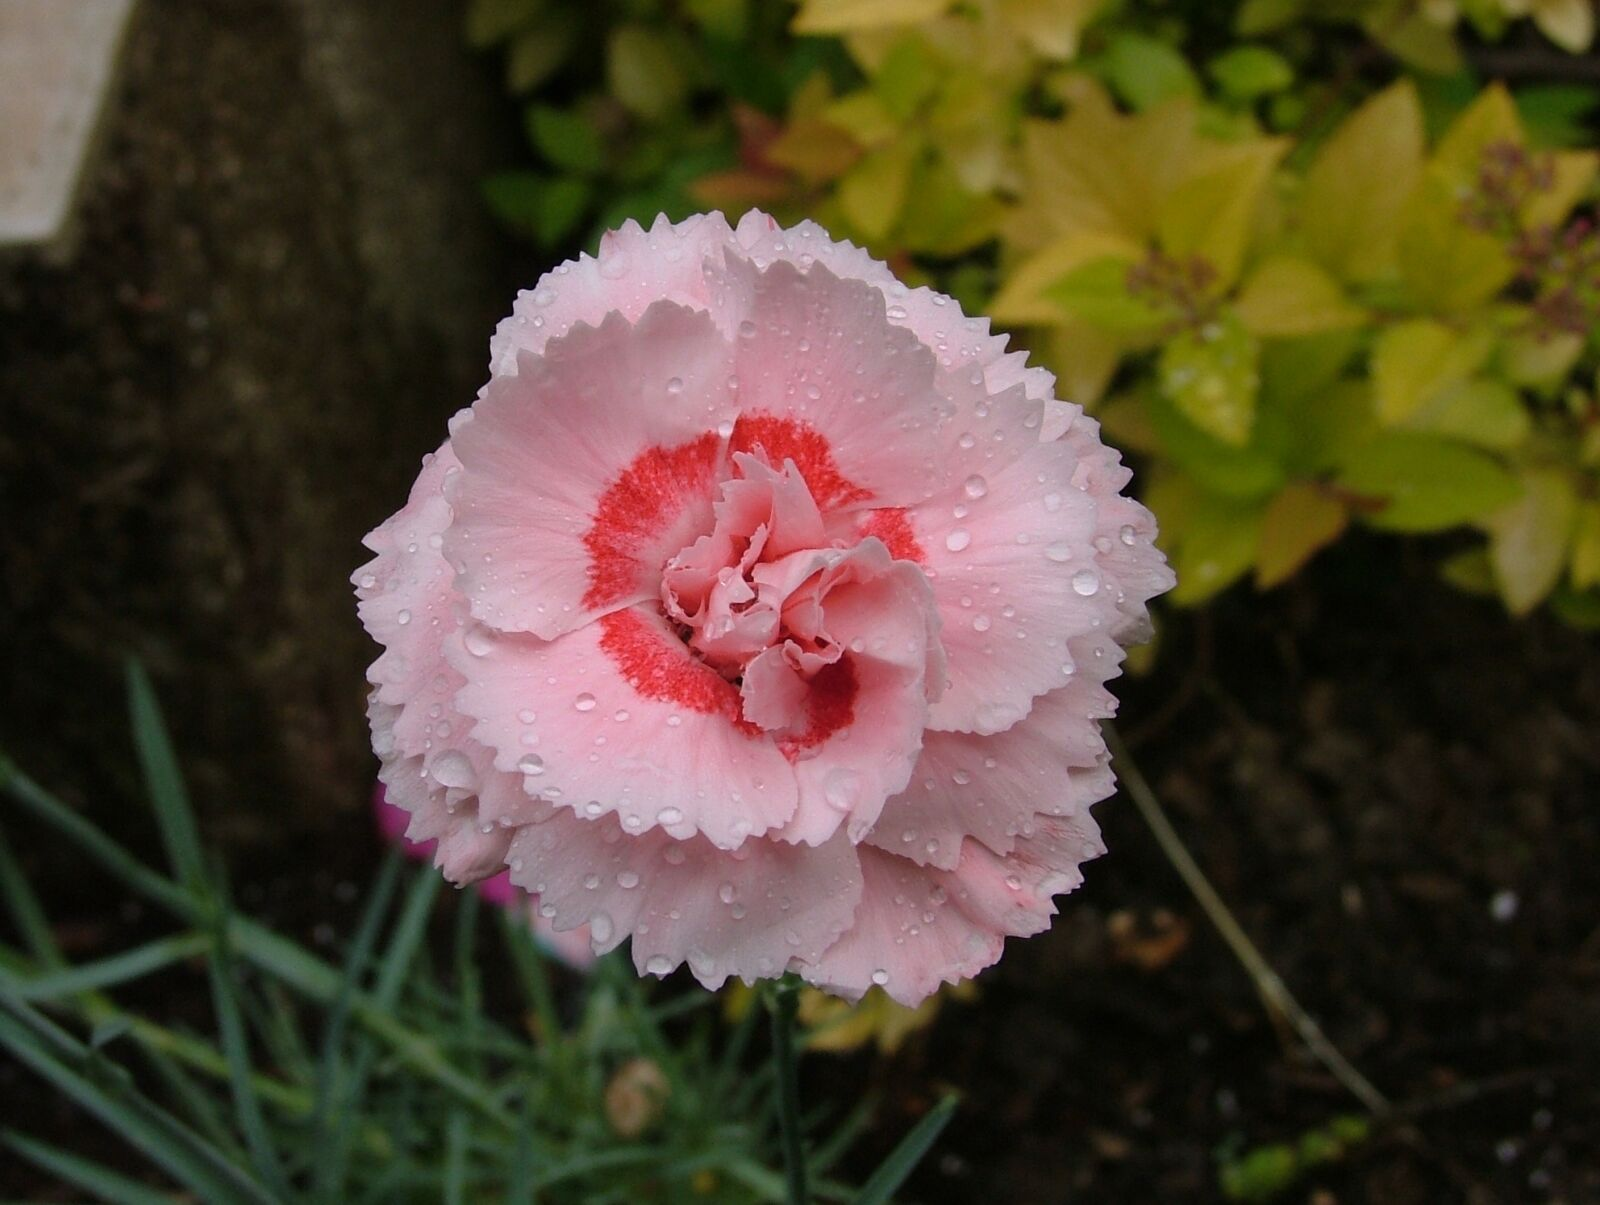 eyelet, carnation pink, flower